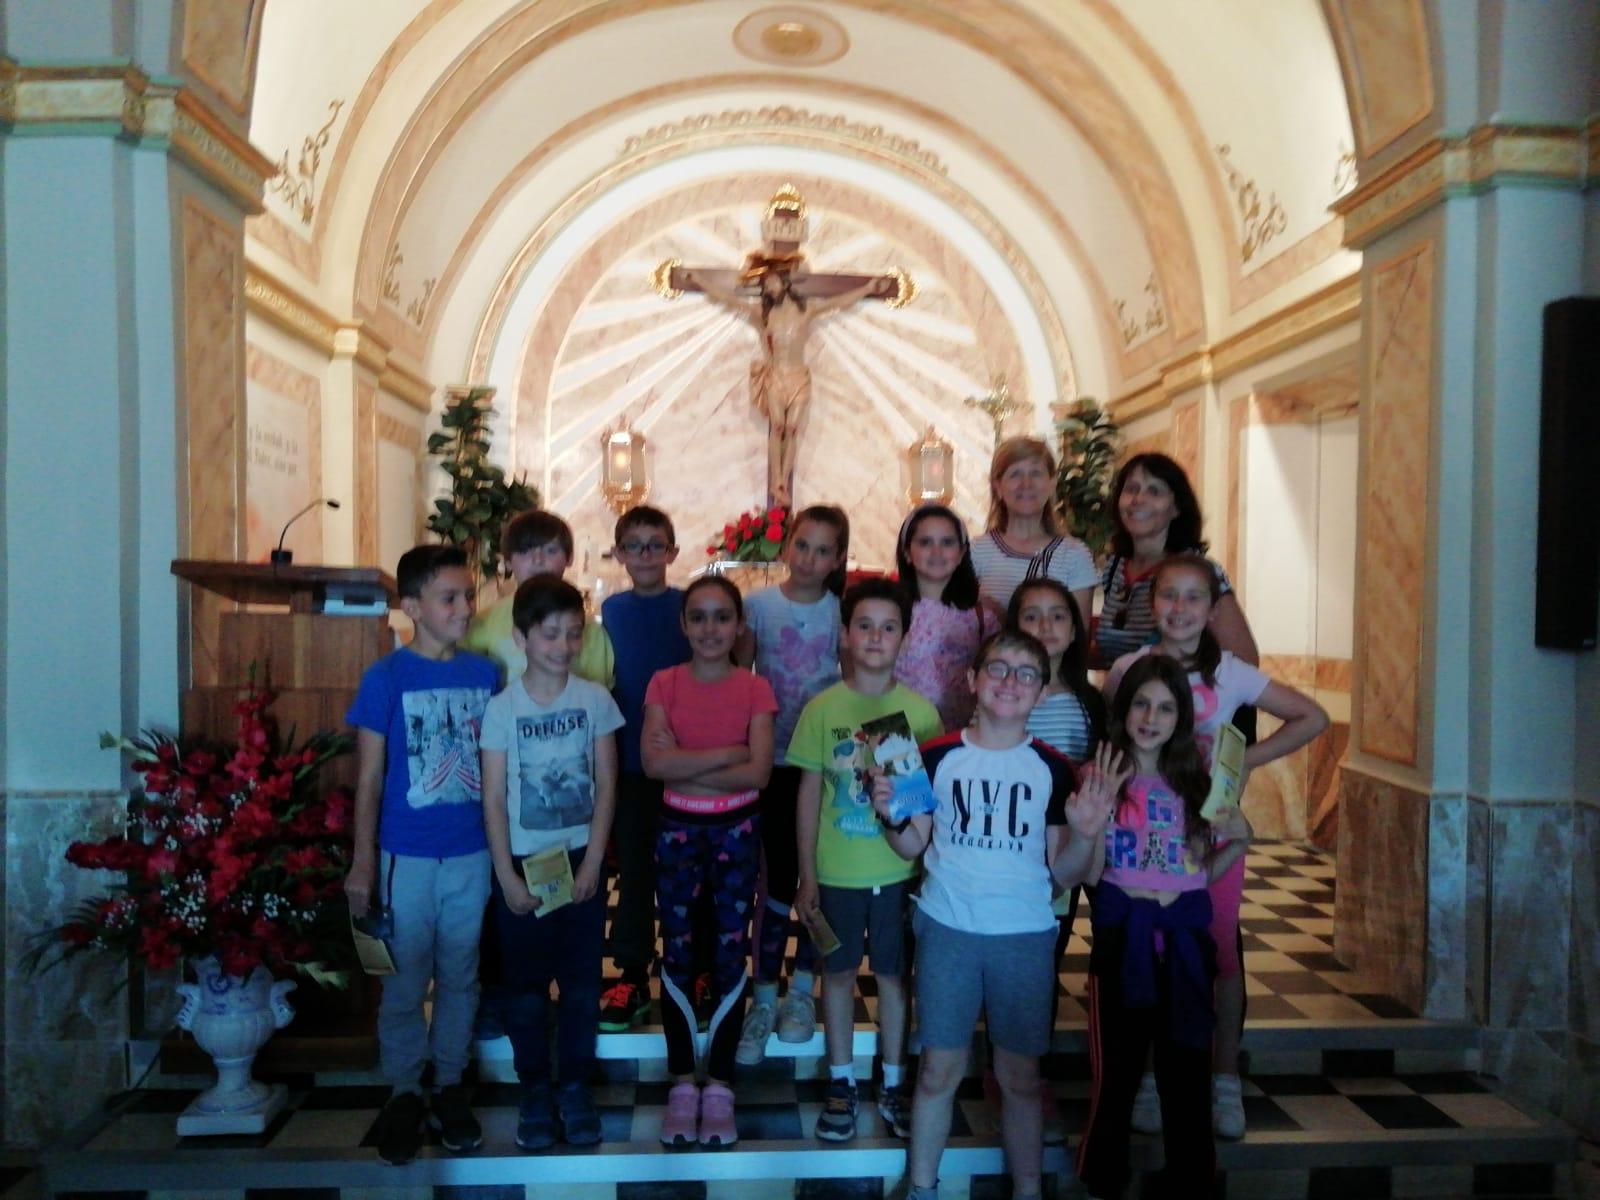 (2019-05-23) Visita ermita alumnos Laura - 3 C primaria - Reina Sofia - María Isabel Berenguer (06)